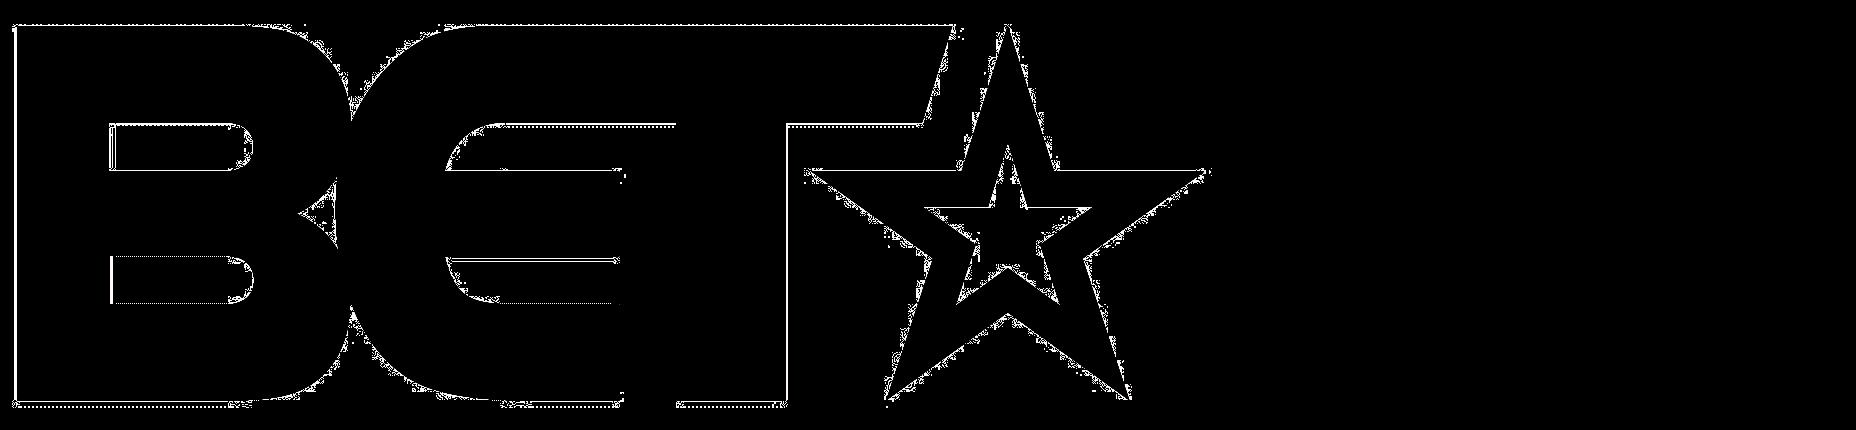 BET HD | Logopedia | Fandom powered by Wikia